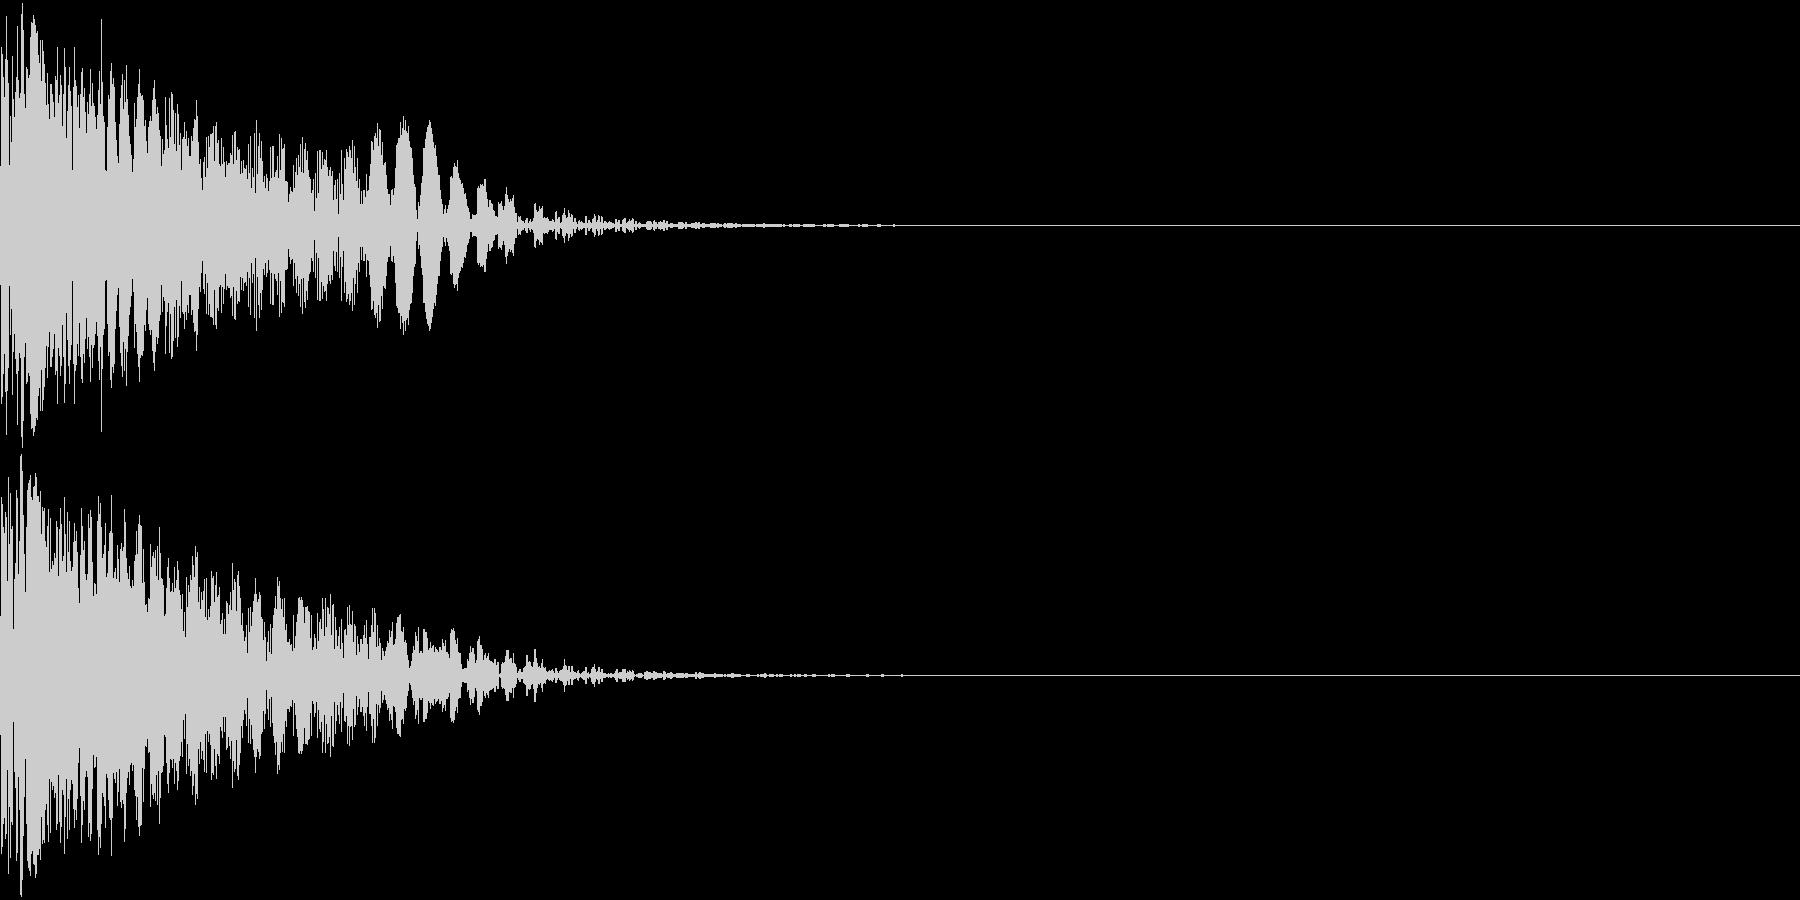 GunMan 高性能レーザー銃 Boomの未再生の波形